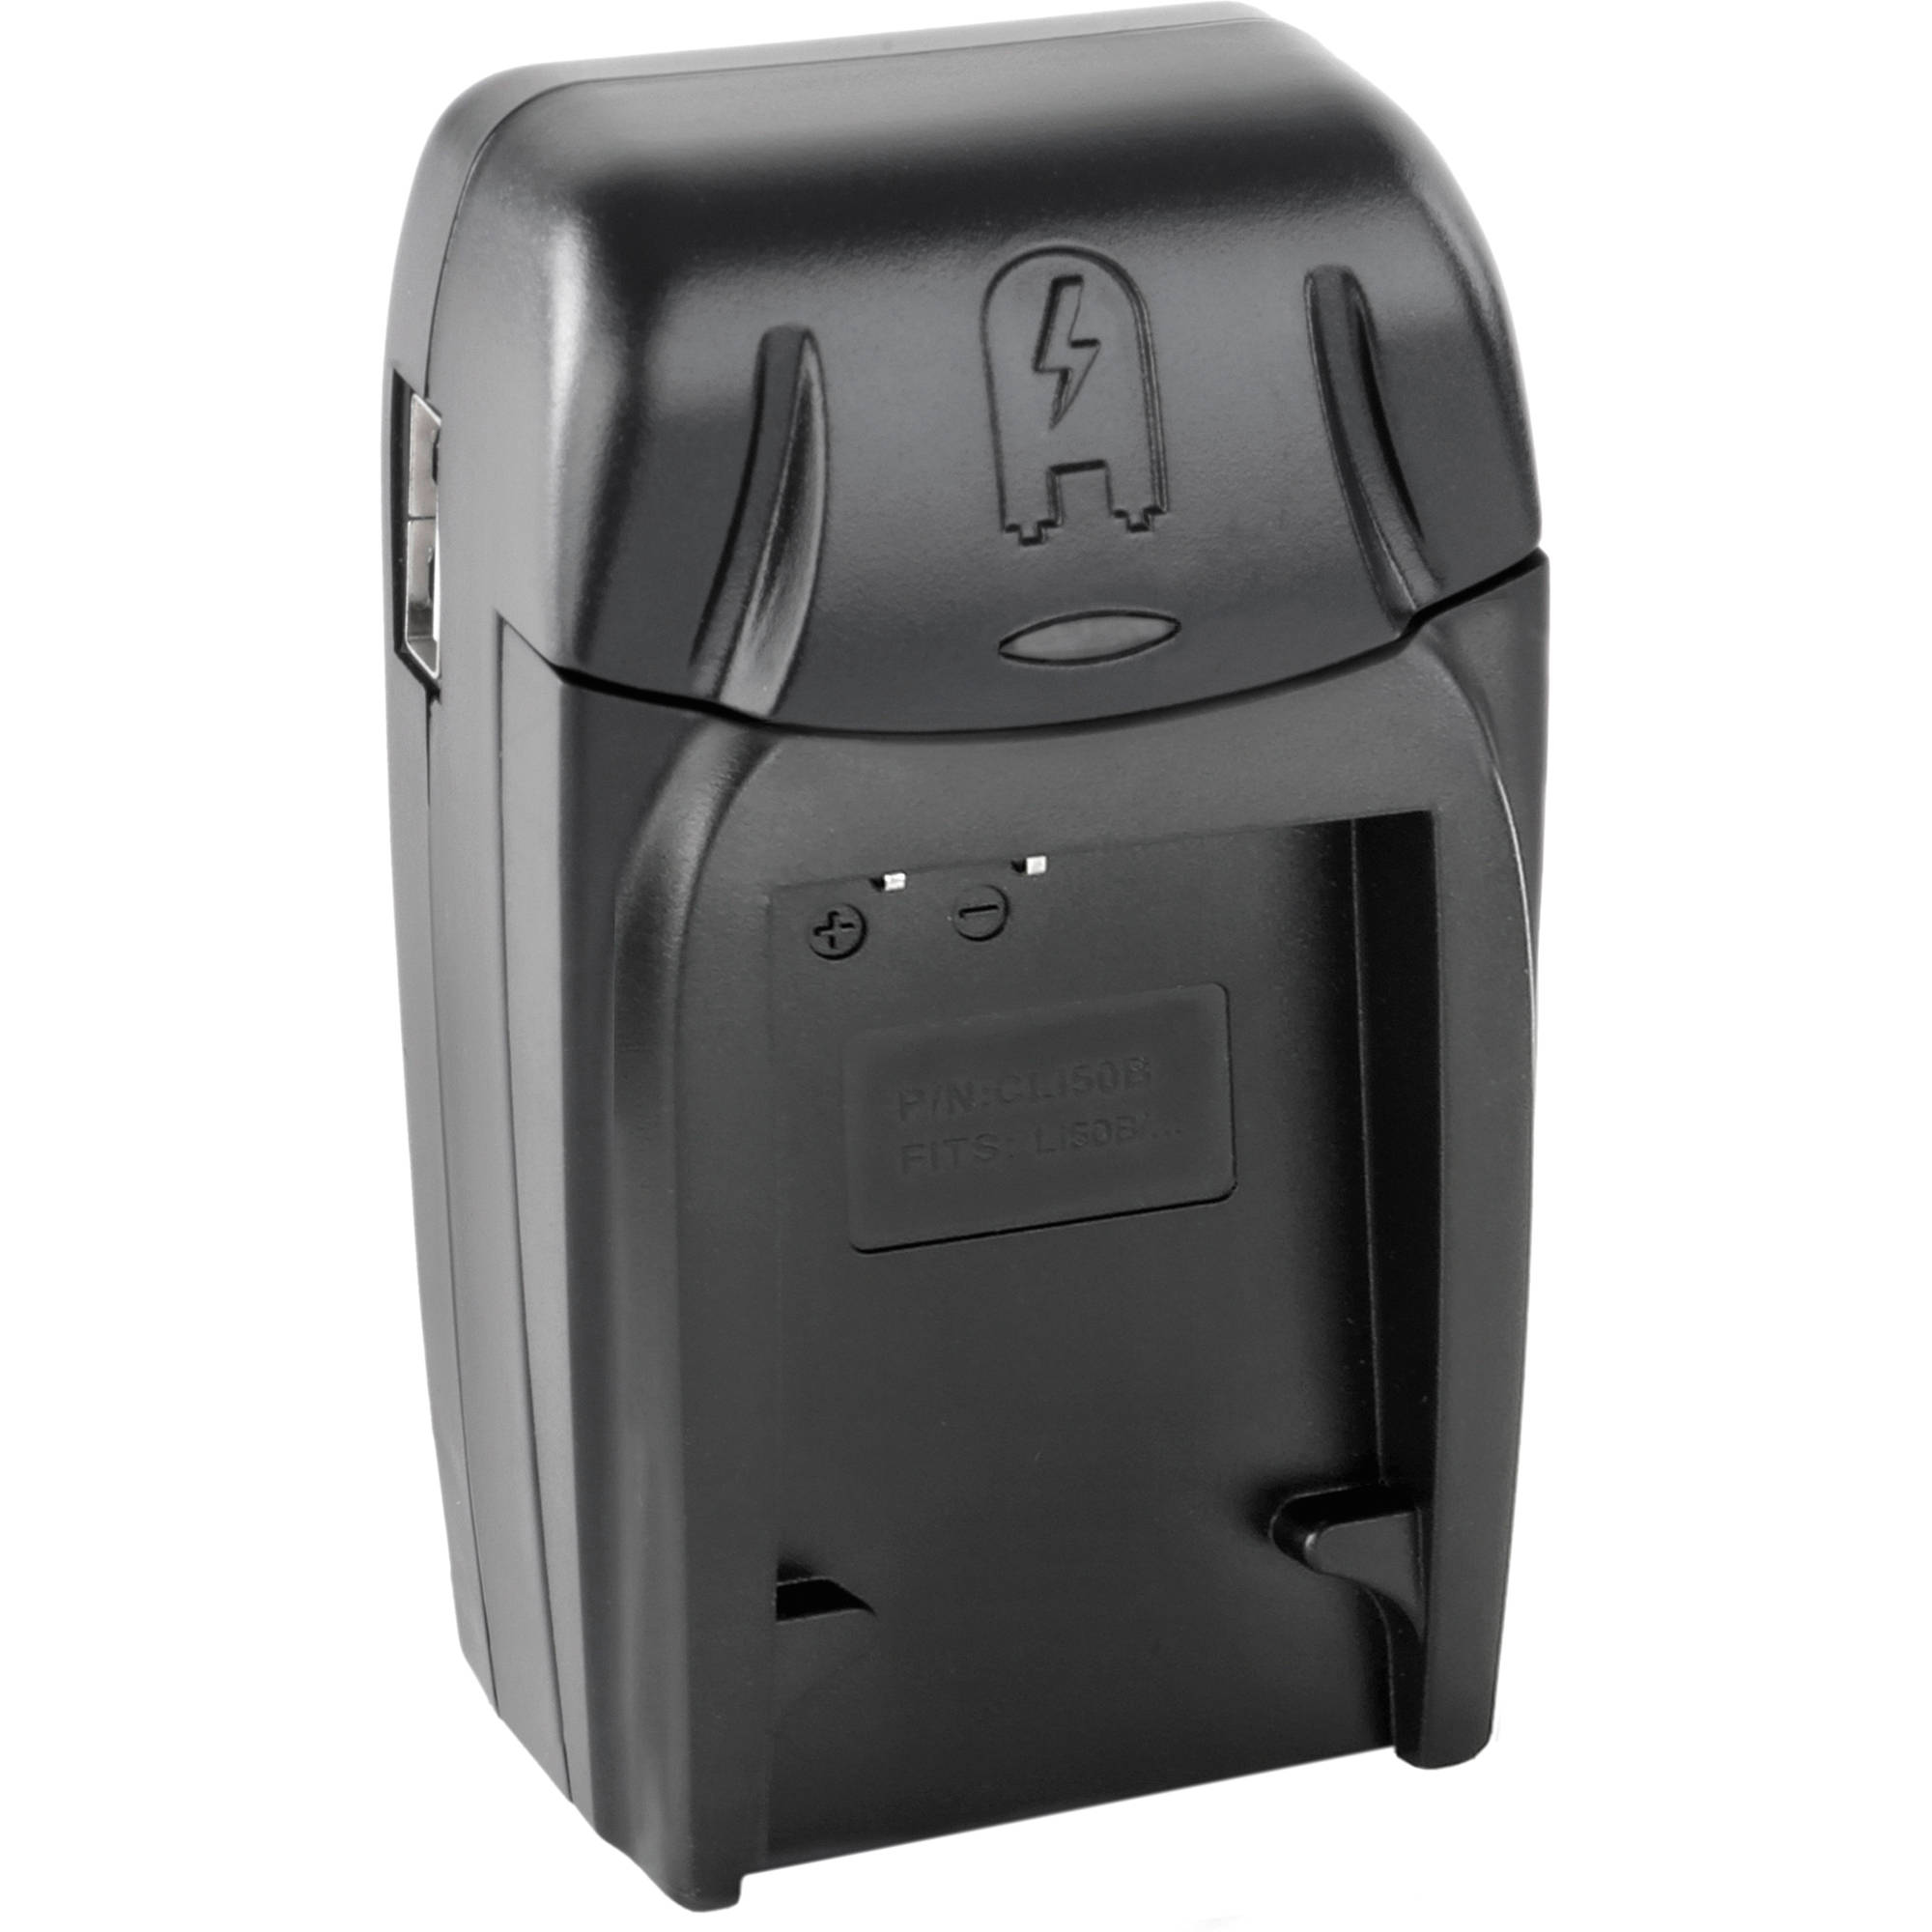 CHARGER for OLYMPUS Li-50B //PENTAX S-li92 //Pan VW-VBX090 2 Replacement Battery